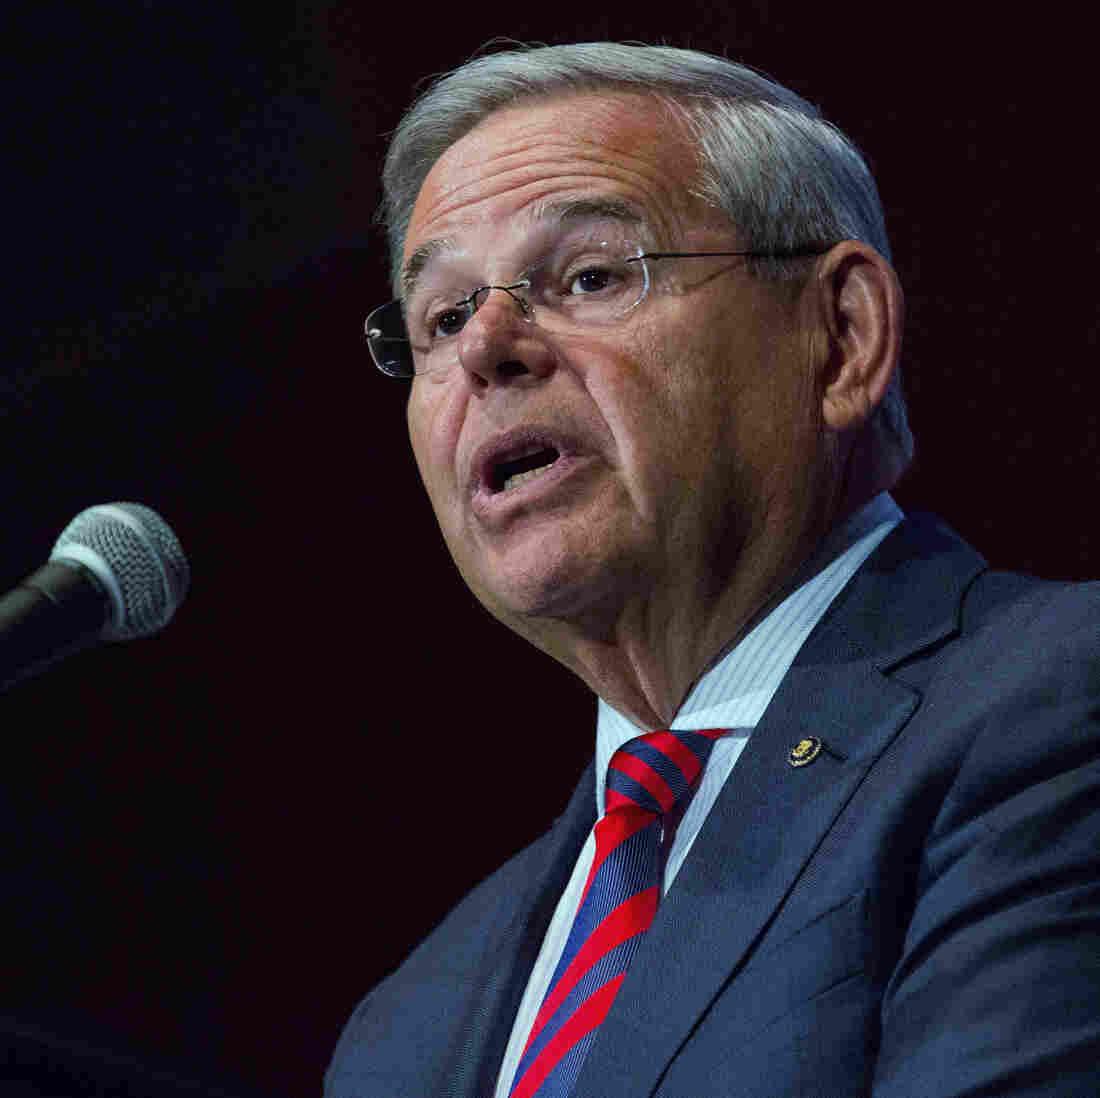 Sen. Menendez Bribery Case Heats Up With New Justice Filing